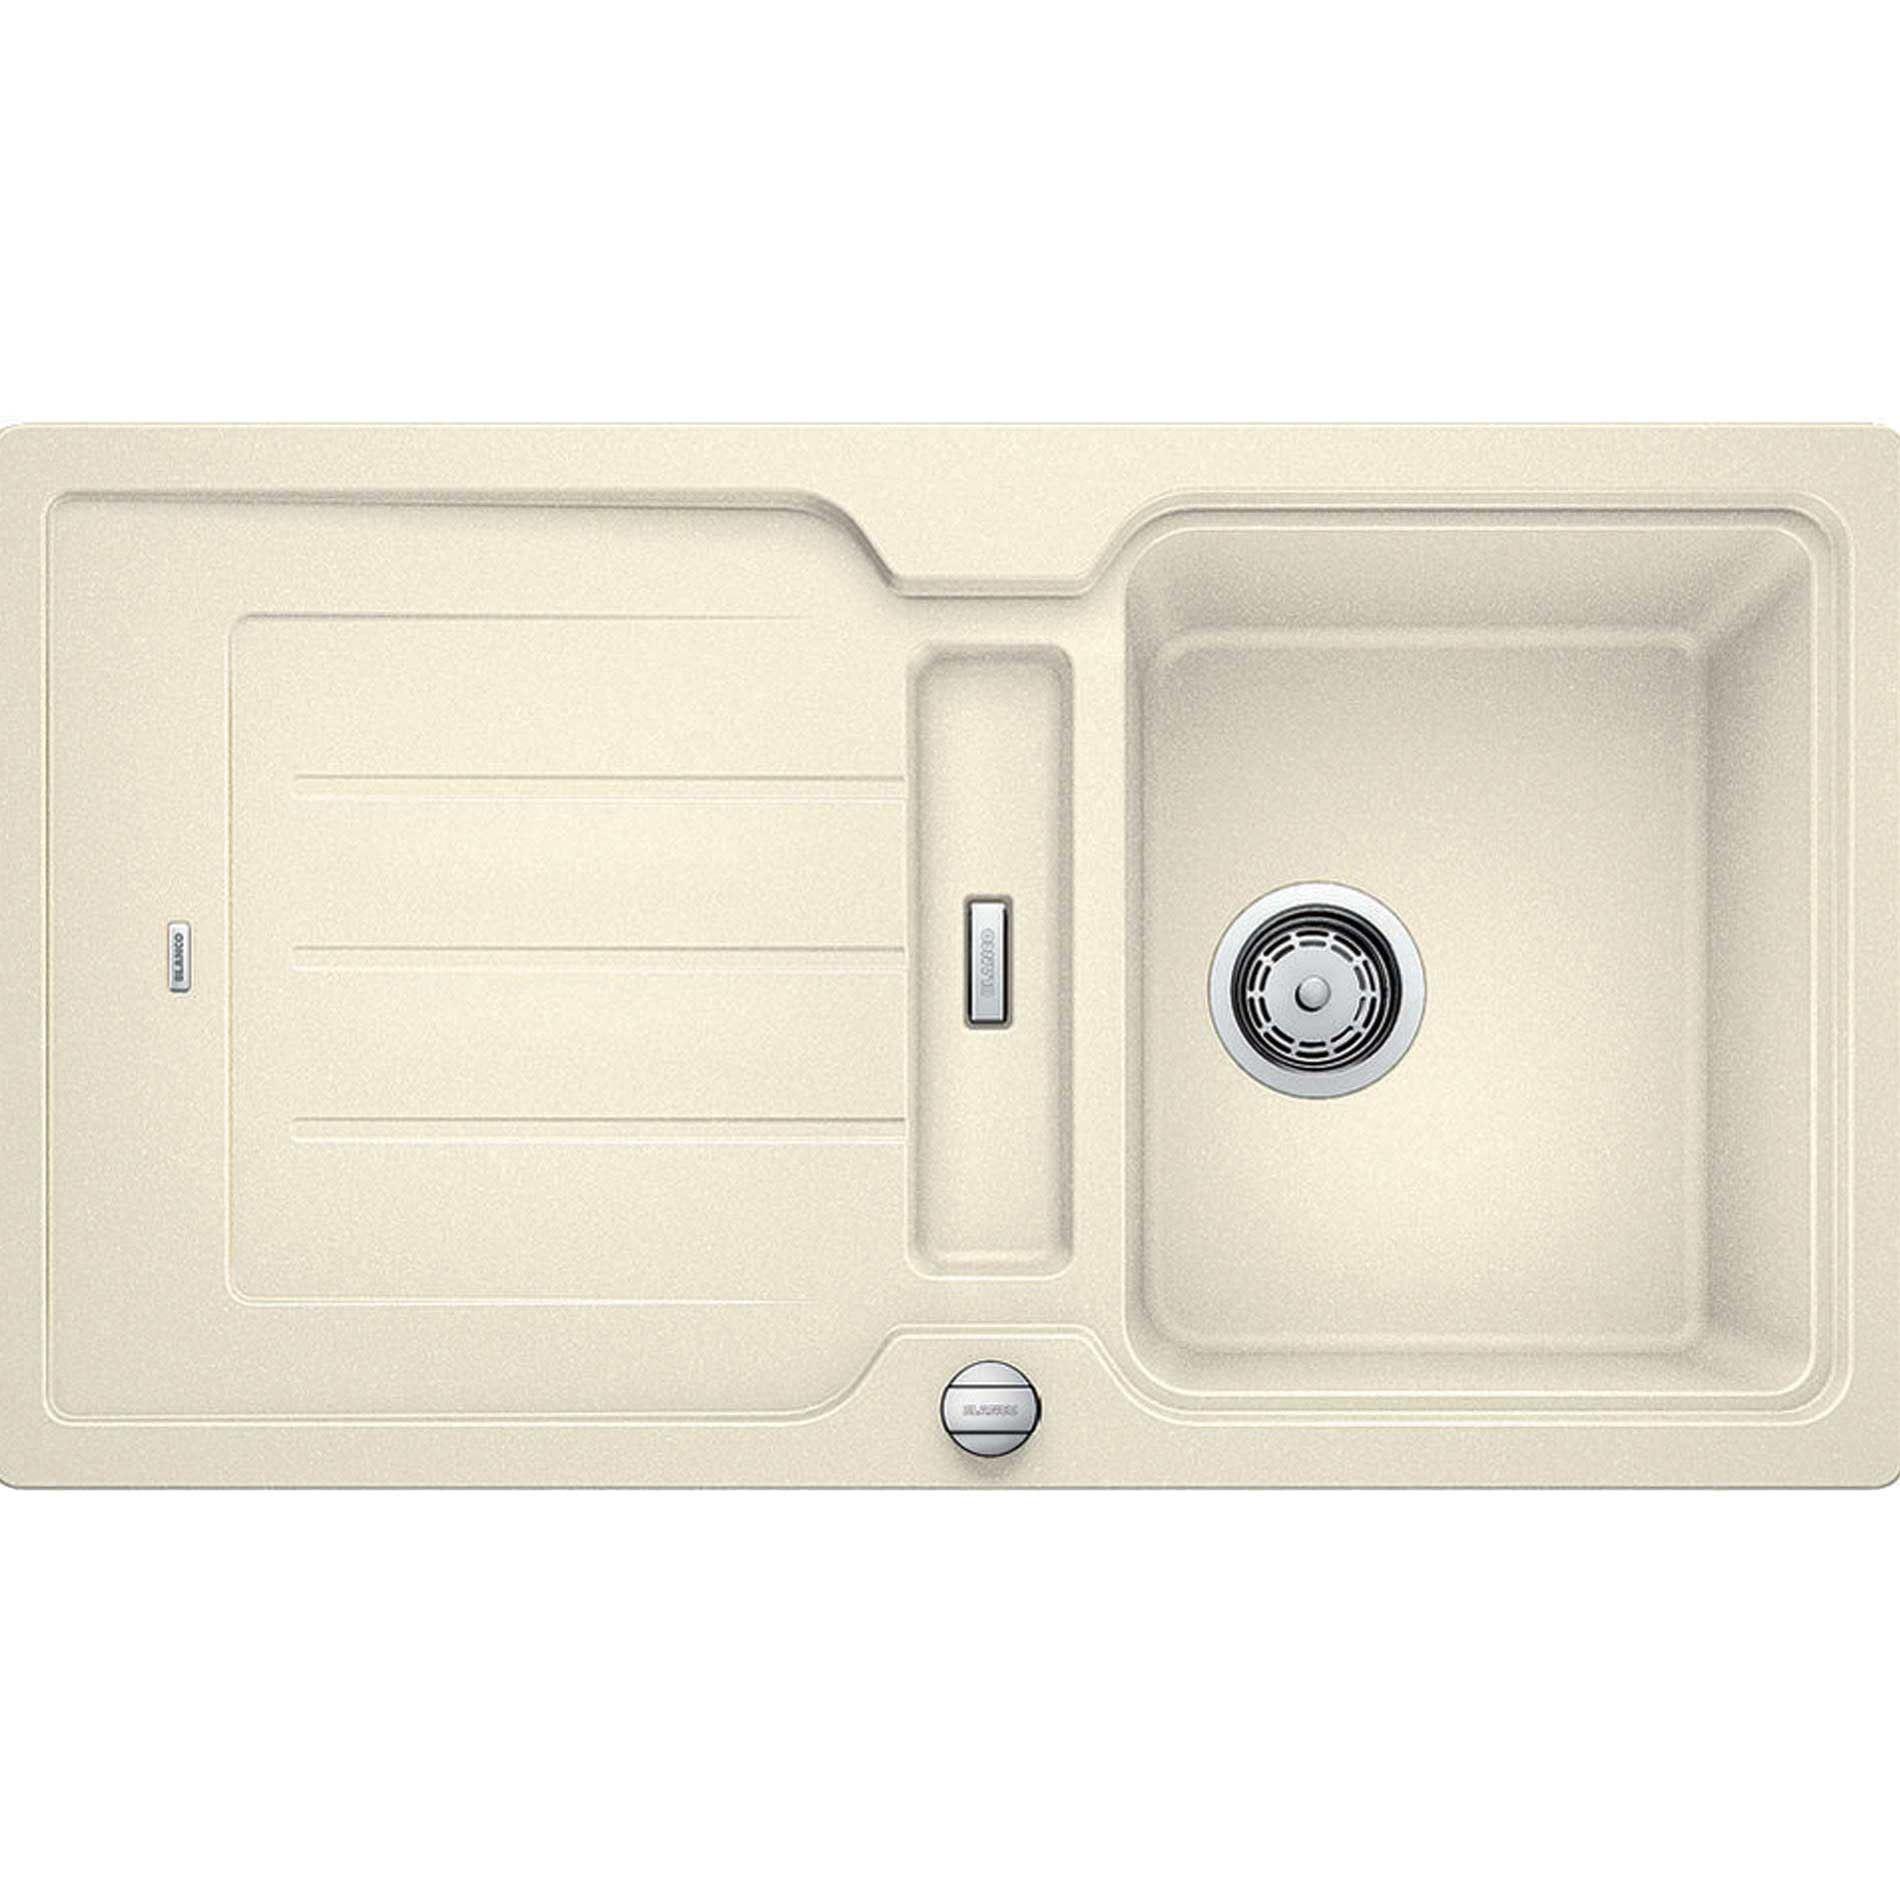 Blanco: Classic Neo 5 S Jasmin Silgranit Sink - Kitchen Sinks & Taps